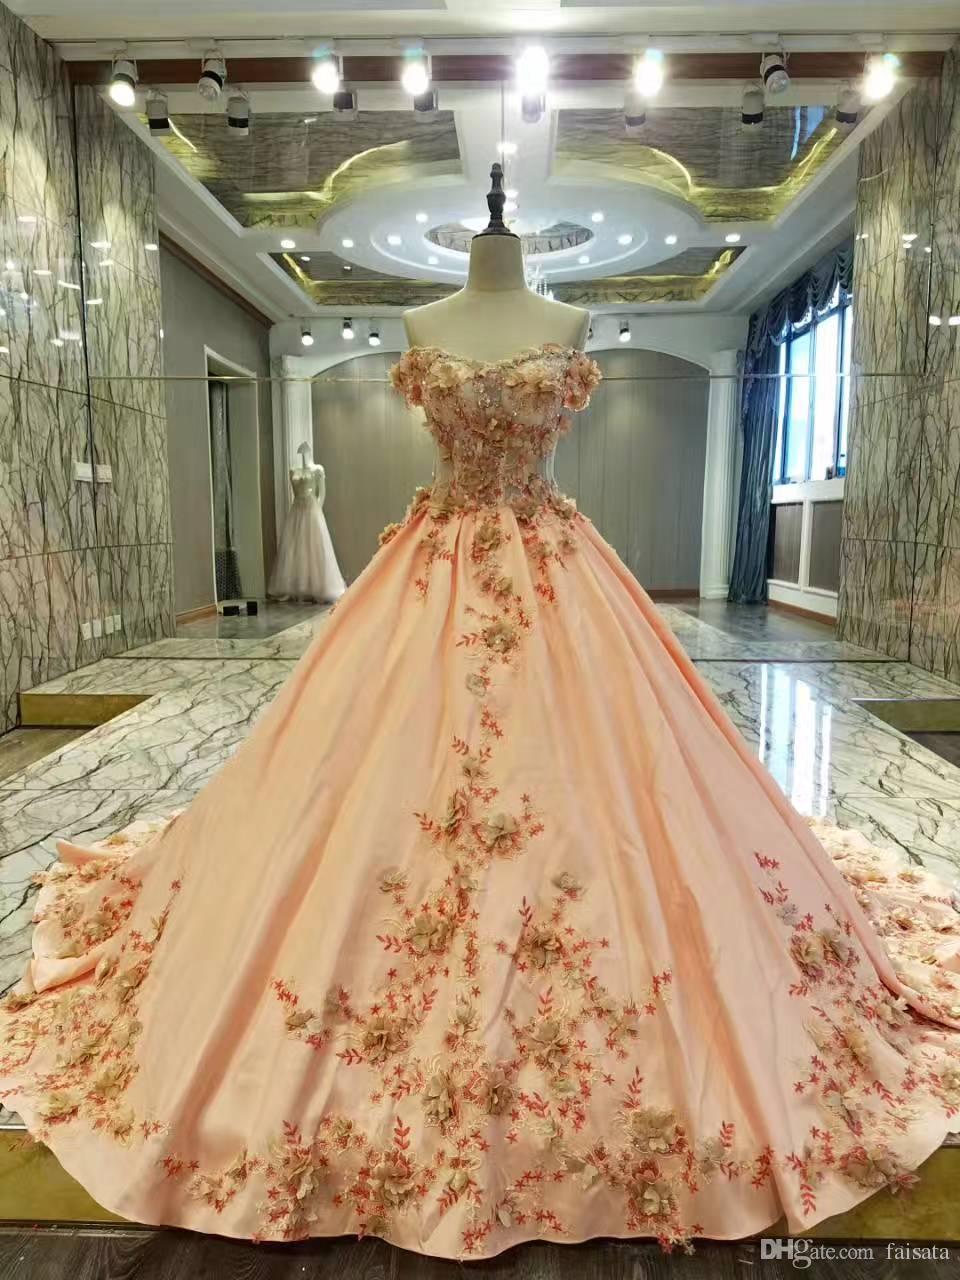 peach color wedding dresses photo - 1